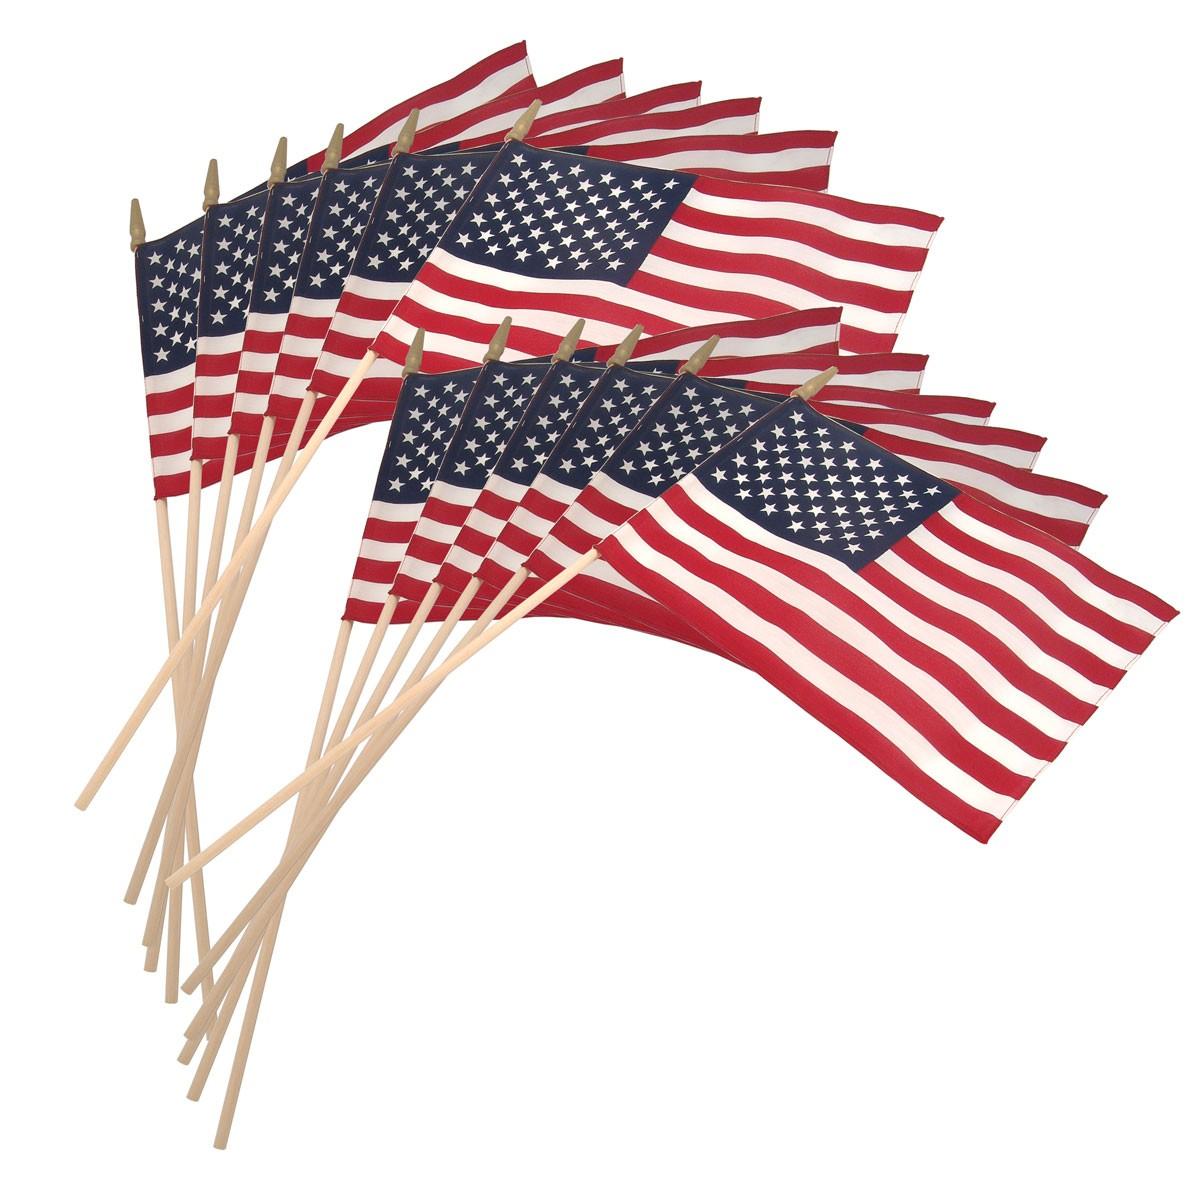 1200x1200 Us Stick Flag 12inx18in 30in X 3 8in Wood Stick